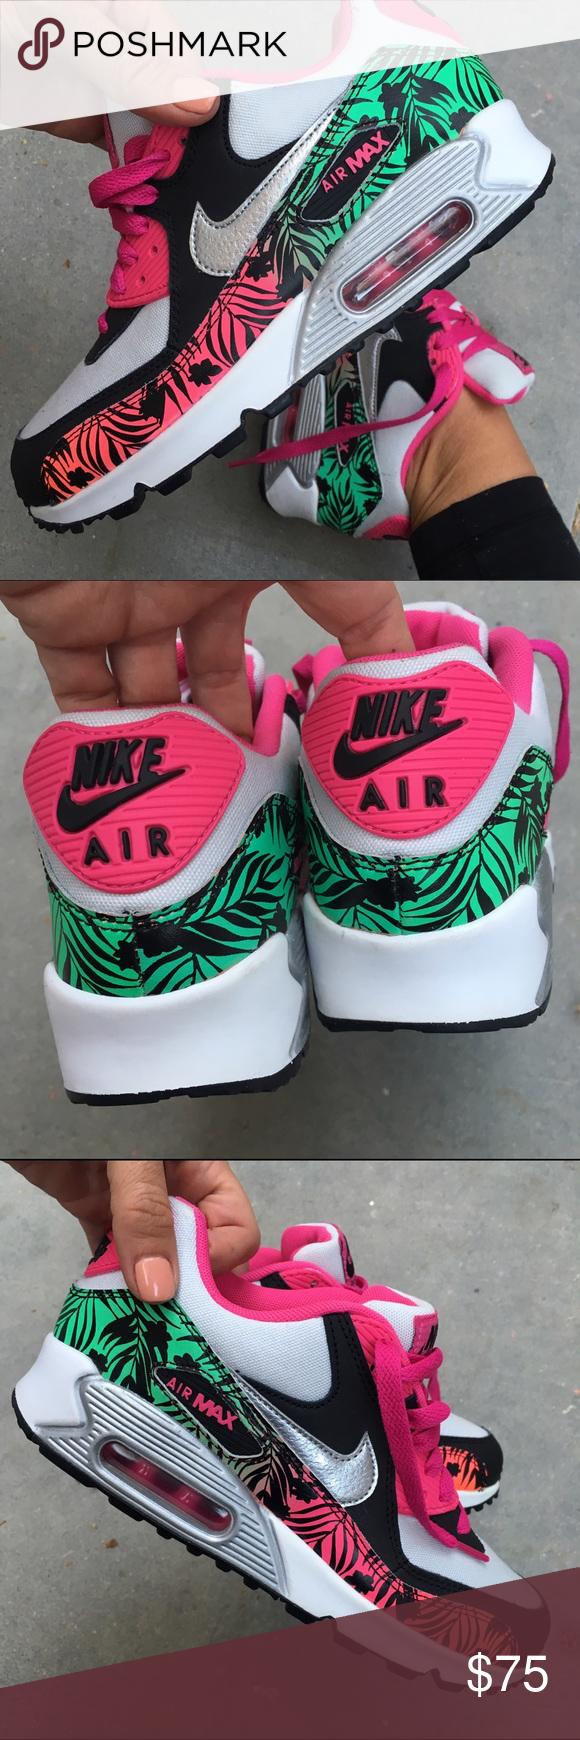 nike air max 90 youth sneakerdiscount